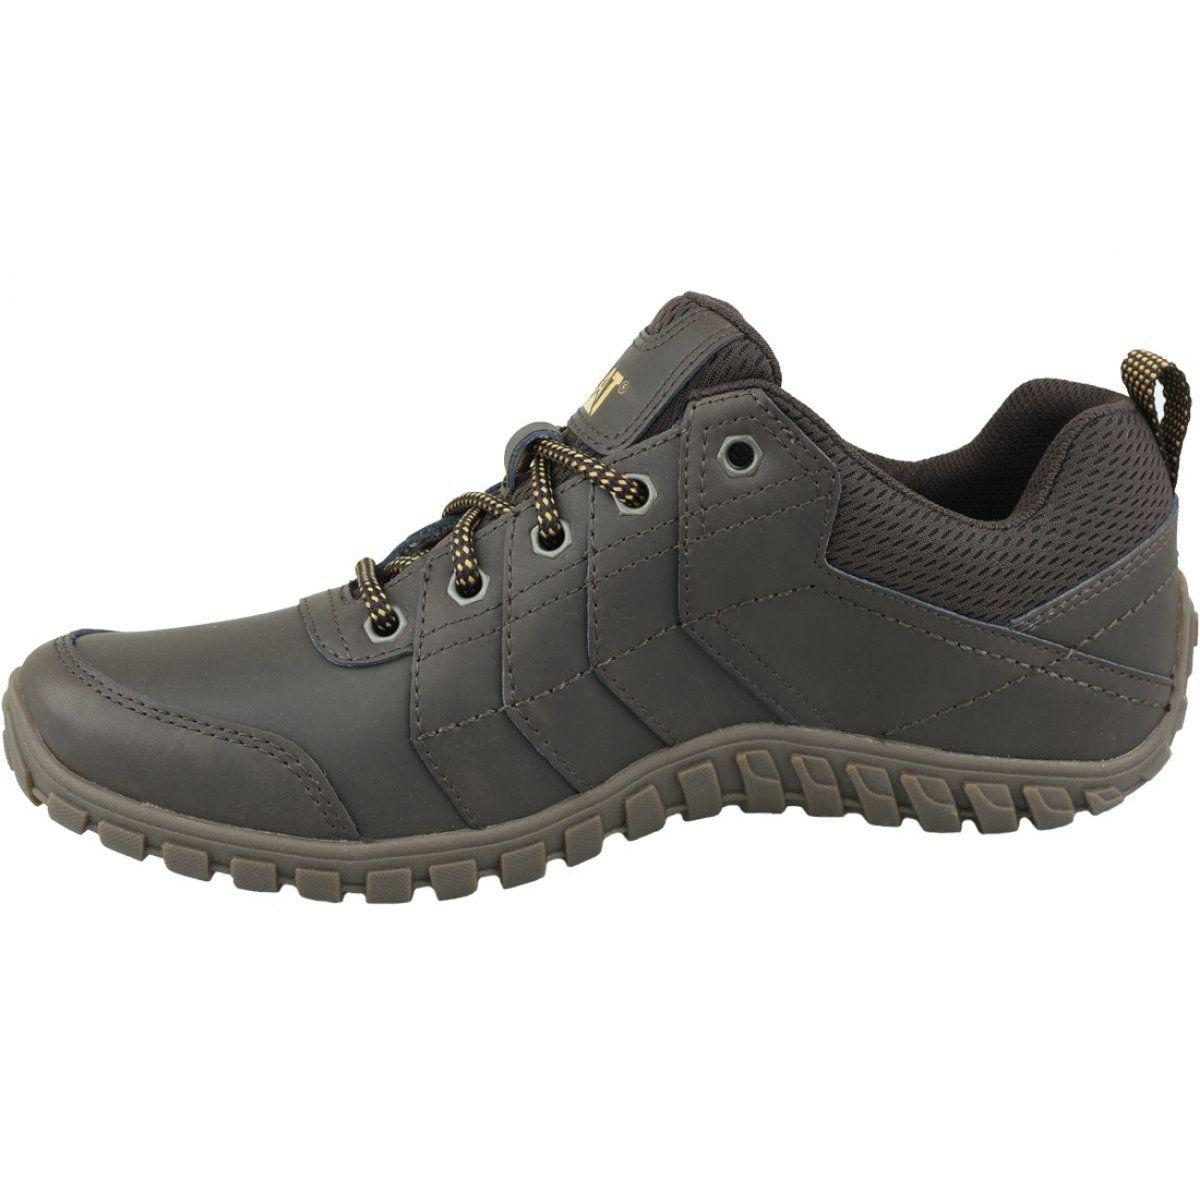 Buty Caterpillar Instruct M P722310 Brazowe Hiking Boots Shoes Boots